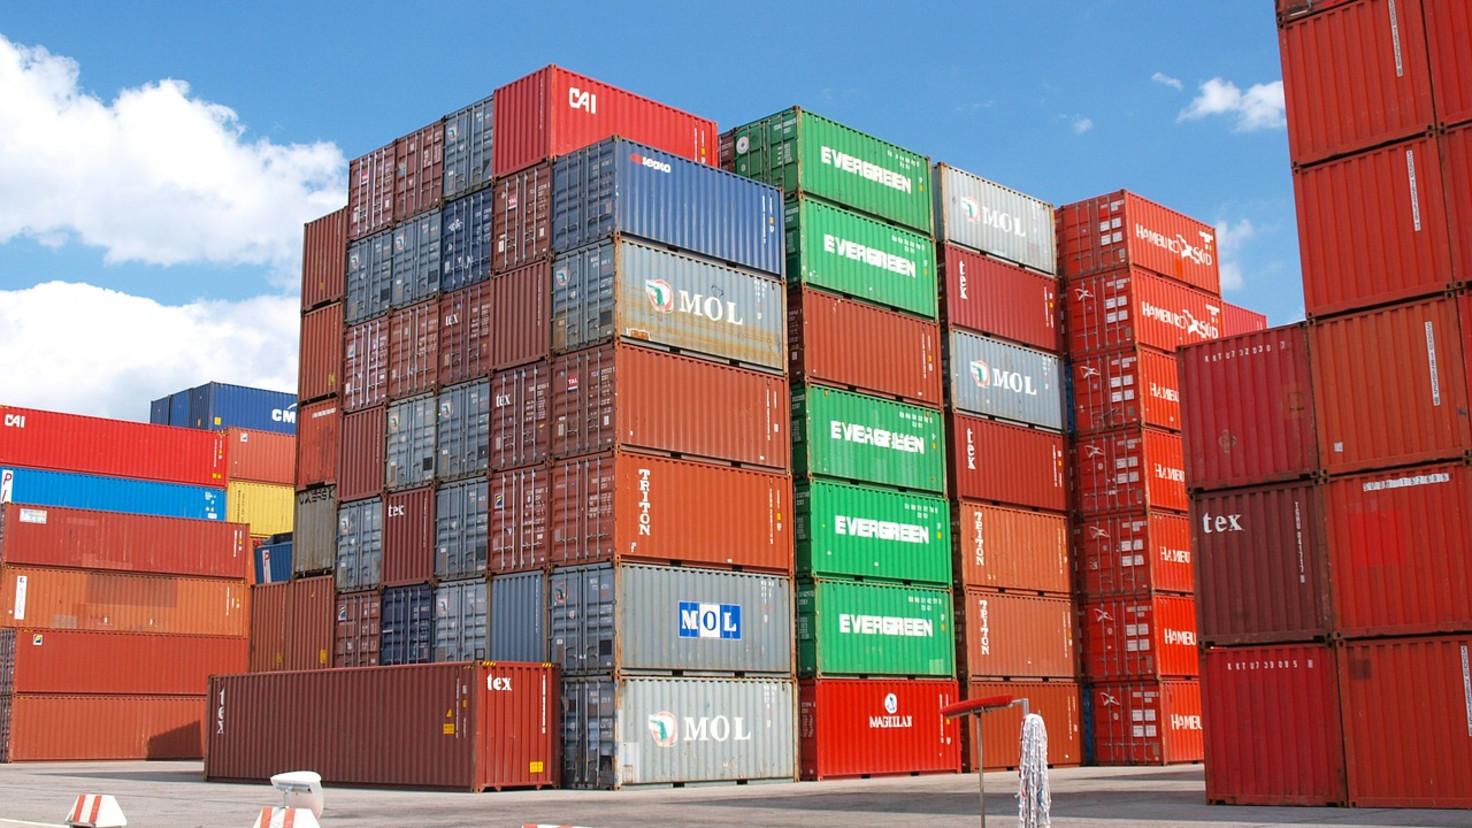 Major Asian logistics operator ESR Cayman raises 1.6bn IPO in Hong Kong